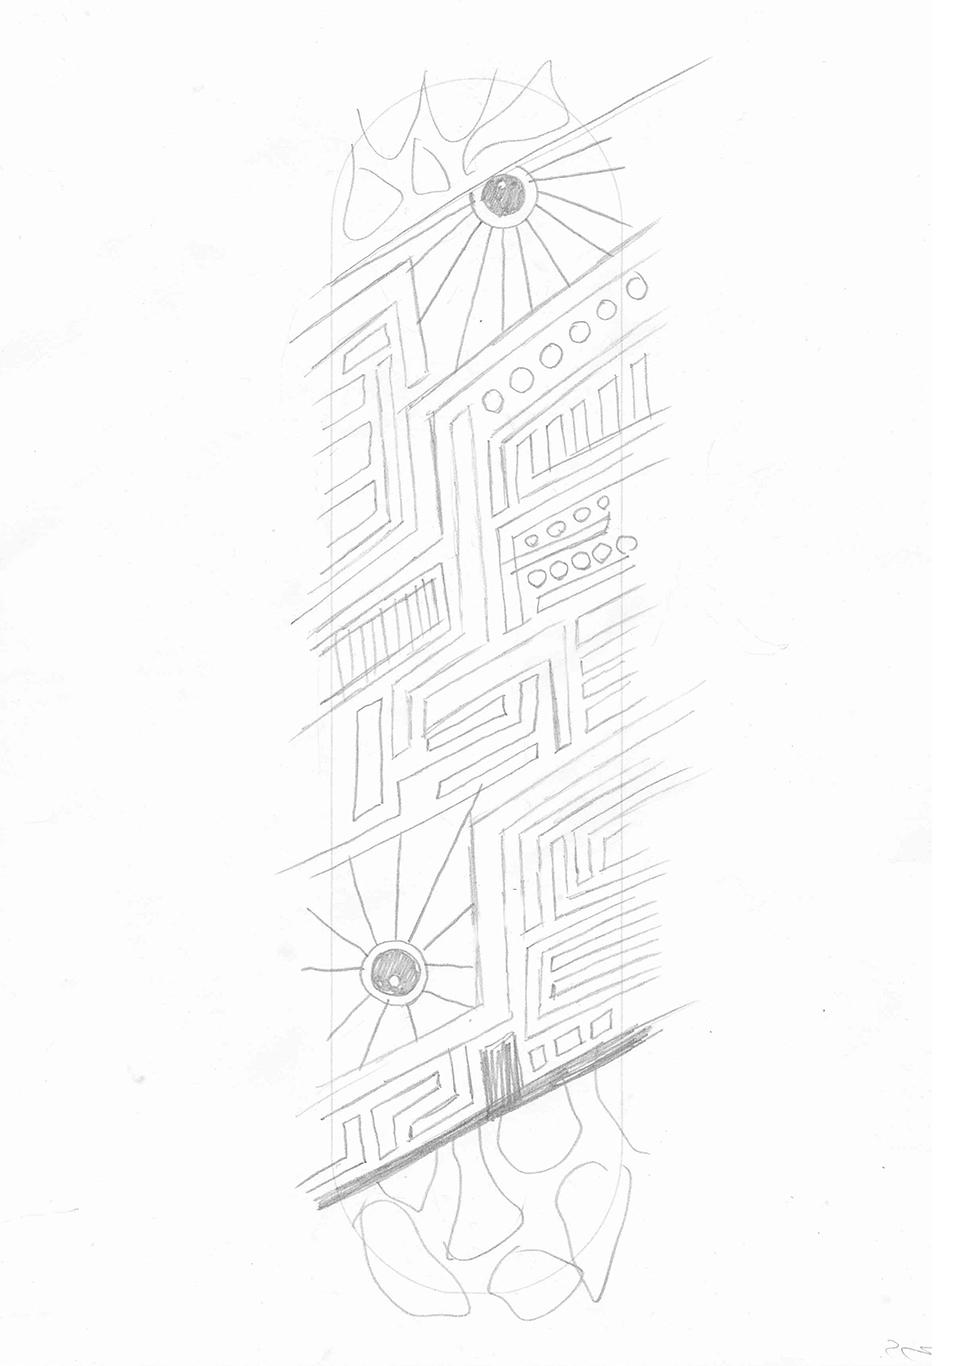 freakart_lv_victorinox_ilustracija_dizains_produkts_12